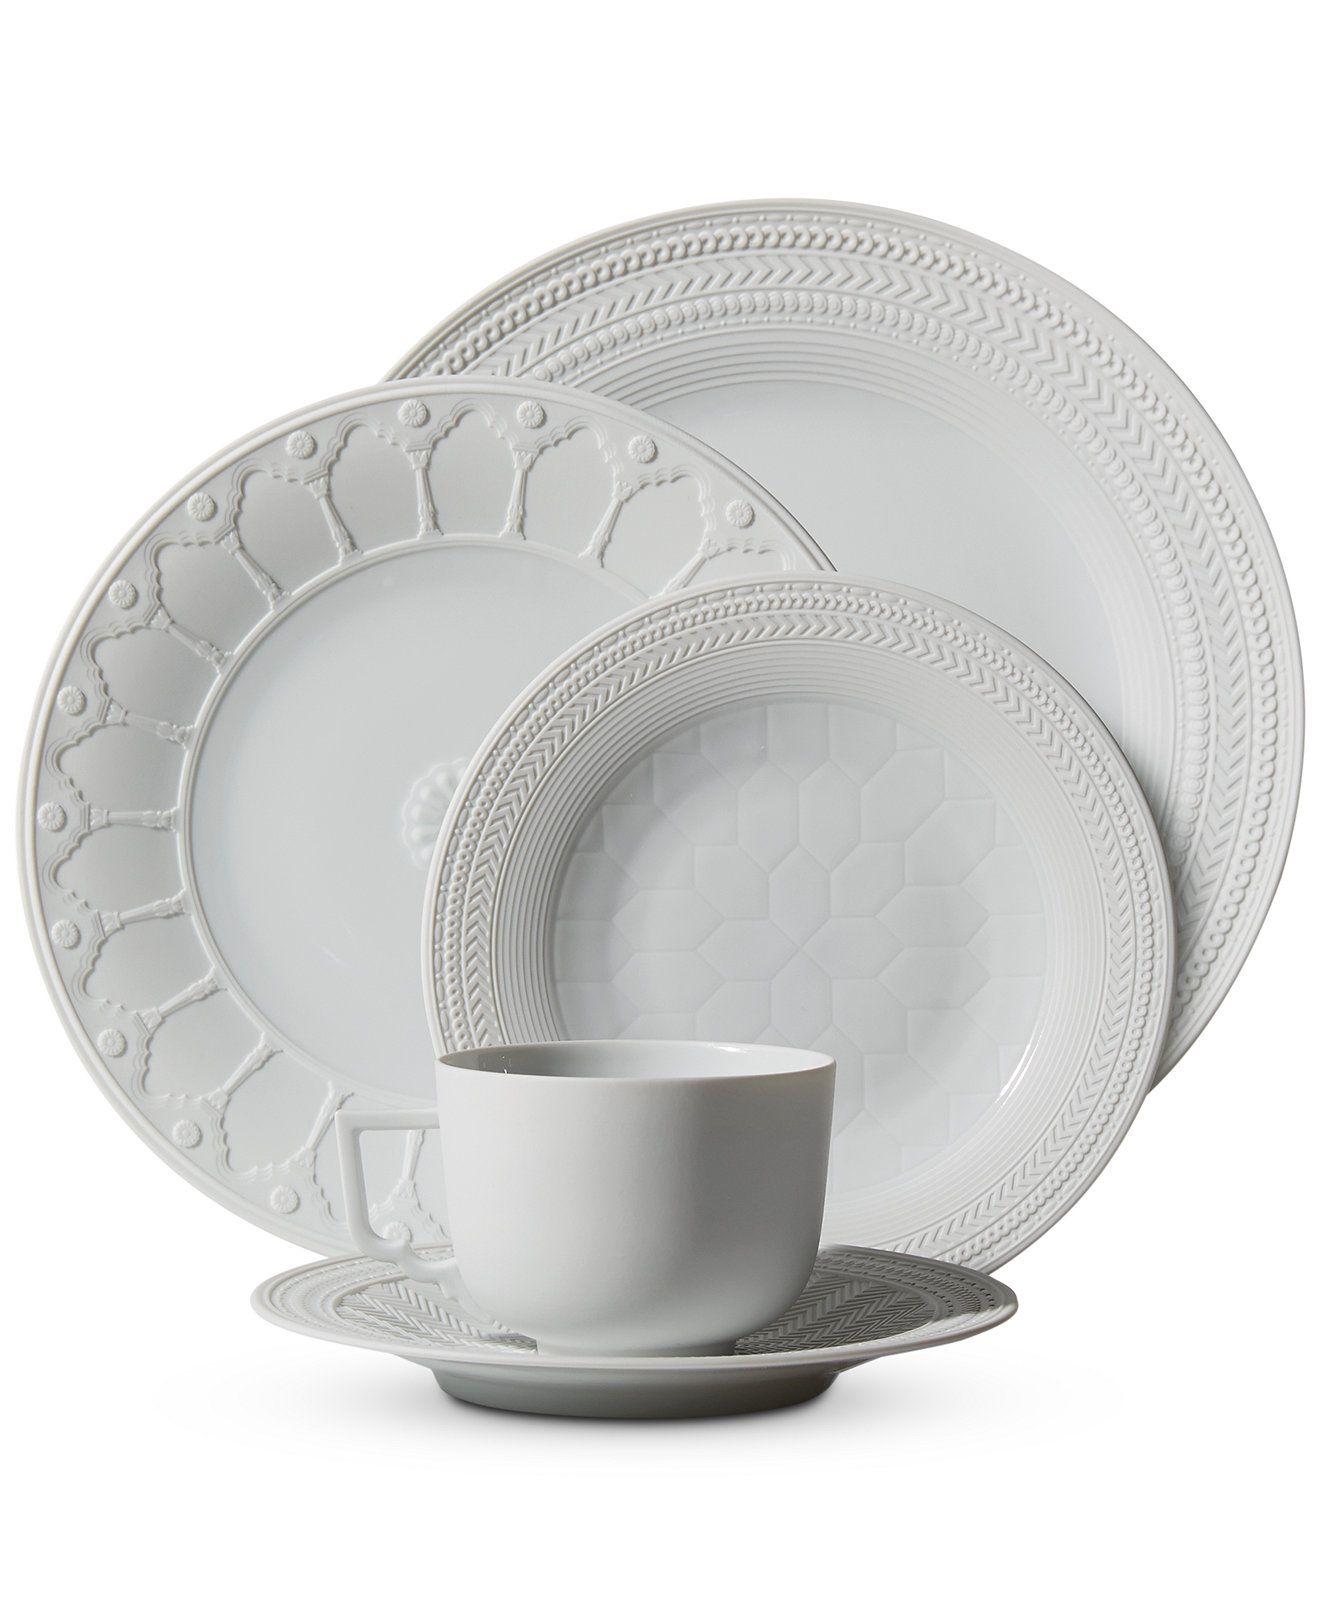 Michael Aram Palace Dinnerware Collection  sc 1 st  Pinterest & Michael Aram Palace Dinnerware Collection | Dinnerware and White ...